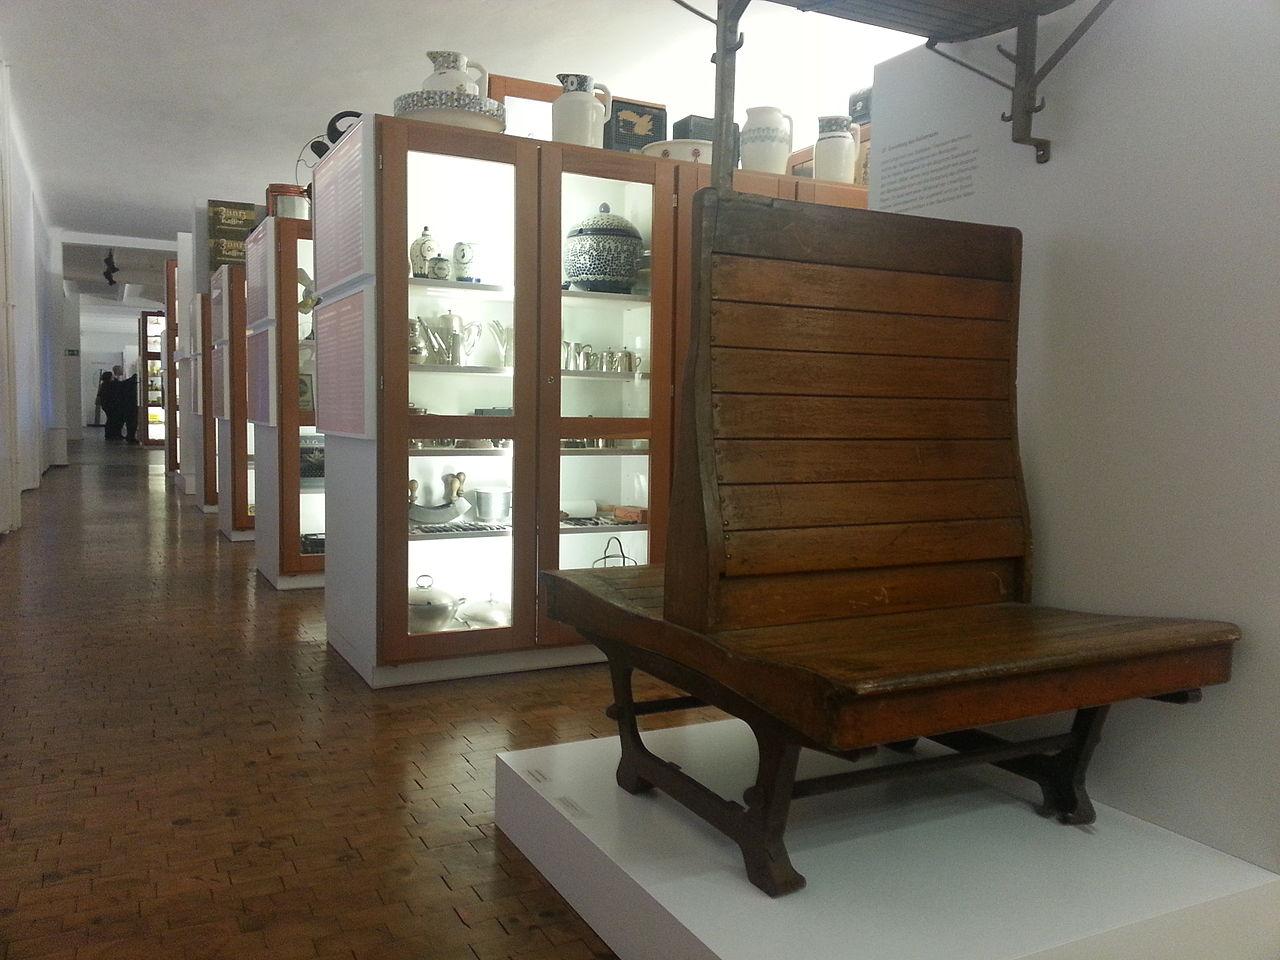 geschichte des bauhauses berlin. Black Bedroom Furniture Sets. Home Design Ideas